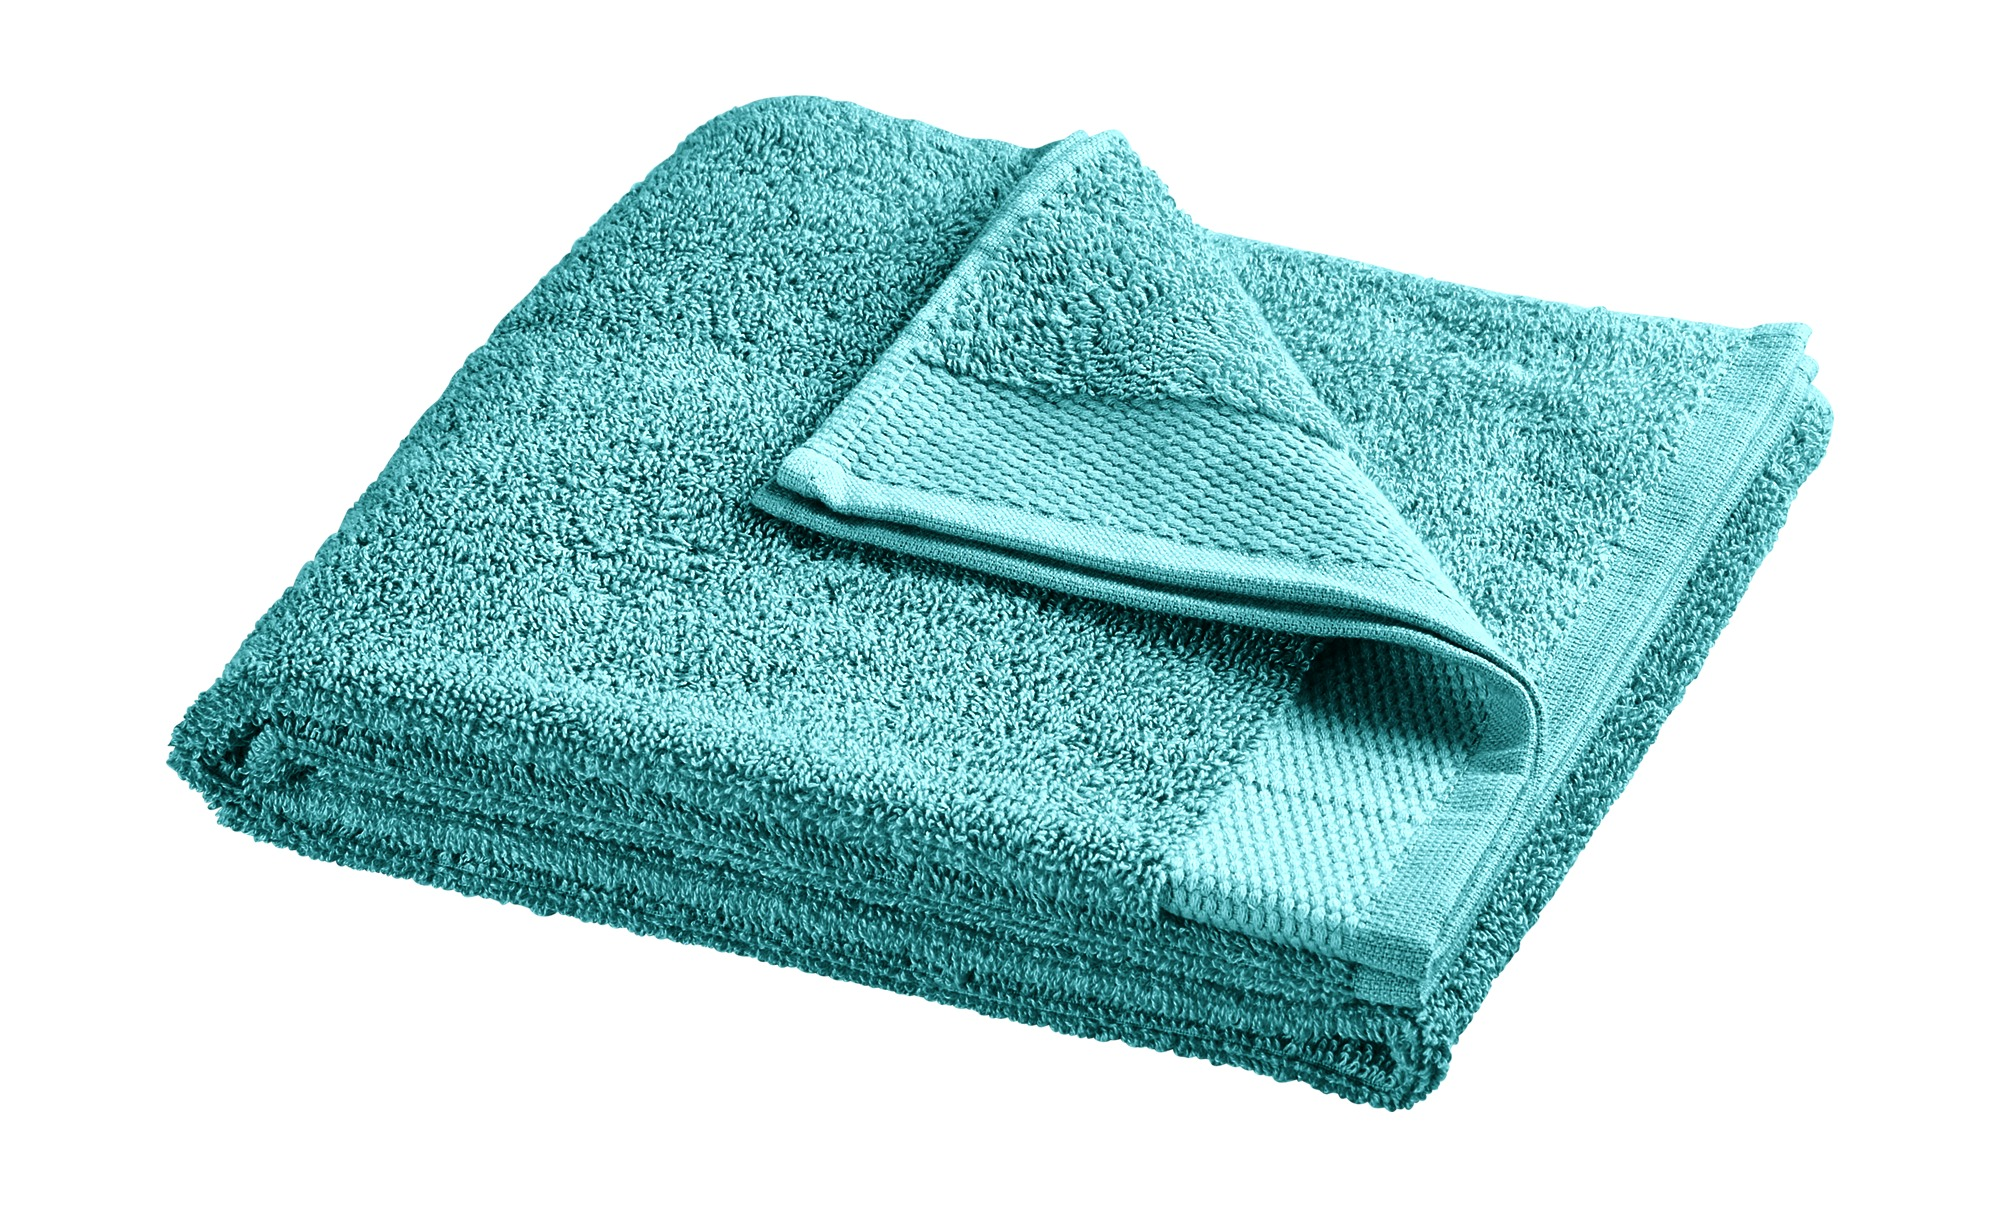 HOME STORY Handtuch  Bubble ¦ türkis/petrol ¦ reine Baumwolle (100% Baumwolle) ¦ Maße (cm): B: 50 Badtextilien und Zubehör > Handtücher & Badetücher > Handtücher - Höffner